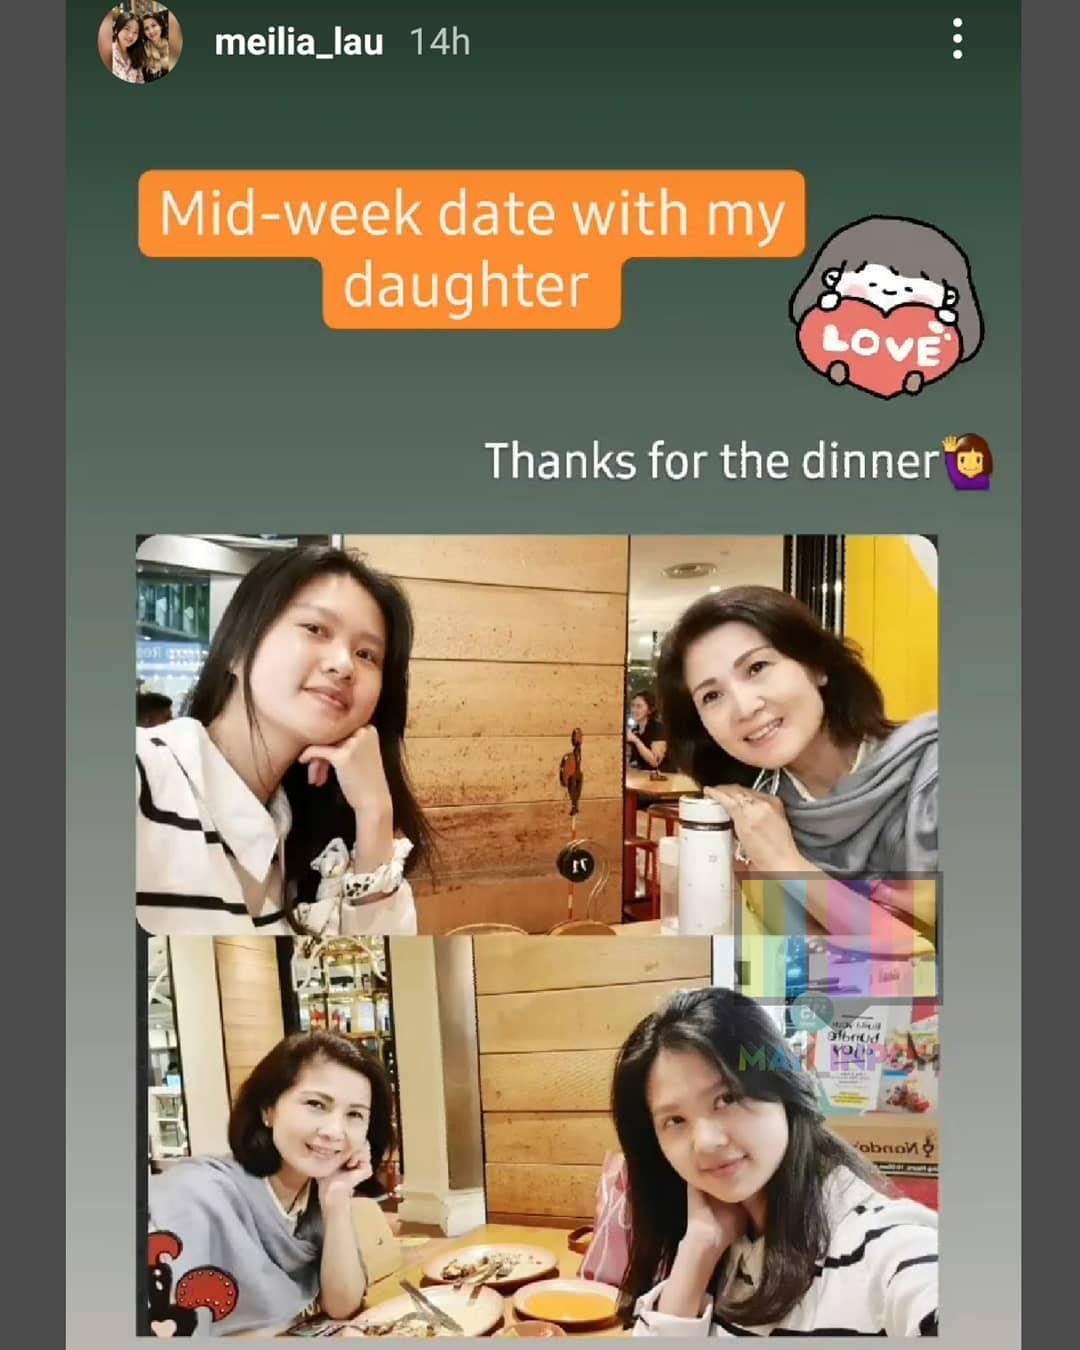 Felicia bersama sang ibu tengah makan malam di sebuah restoran.